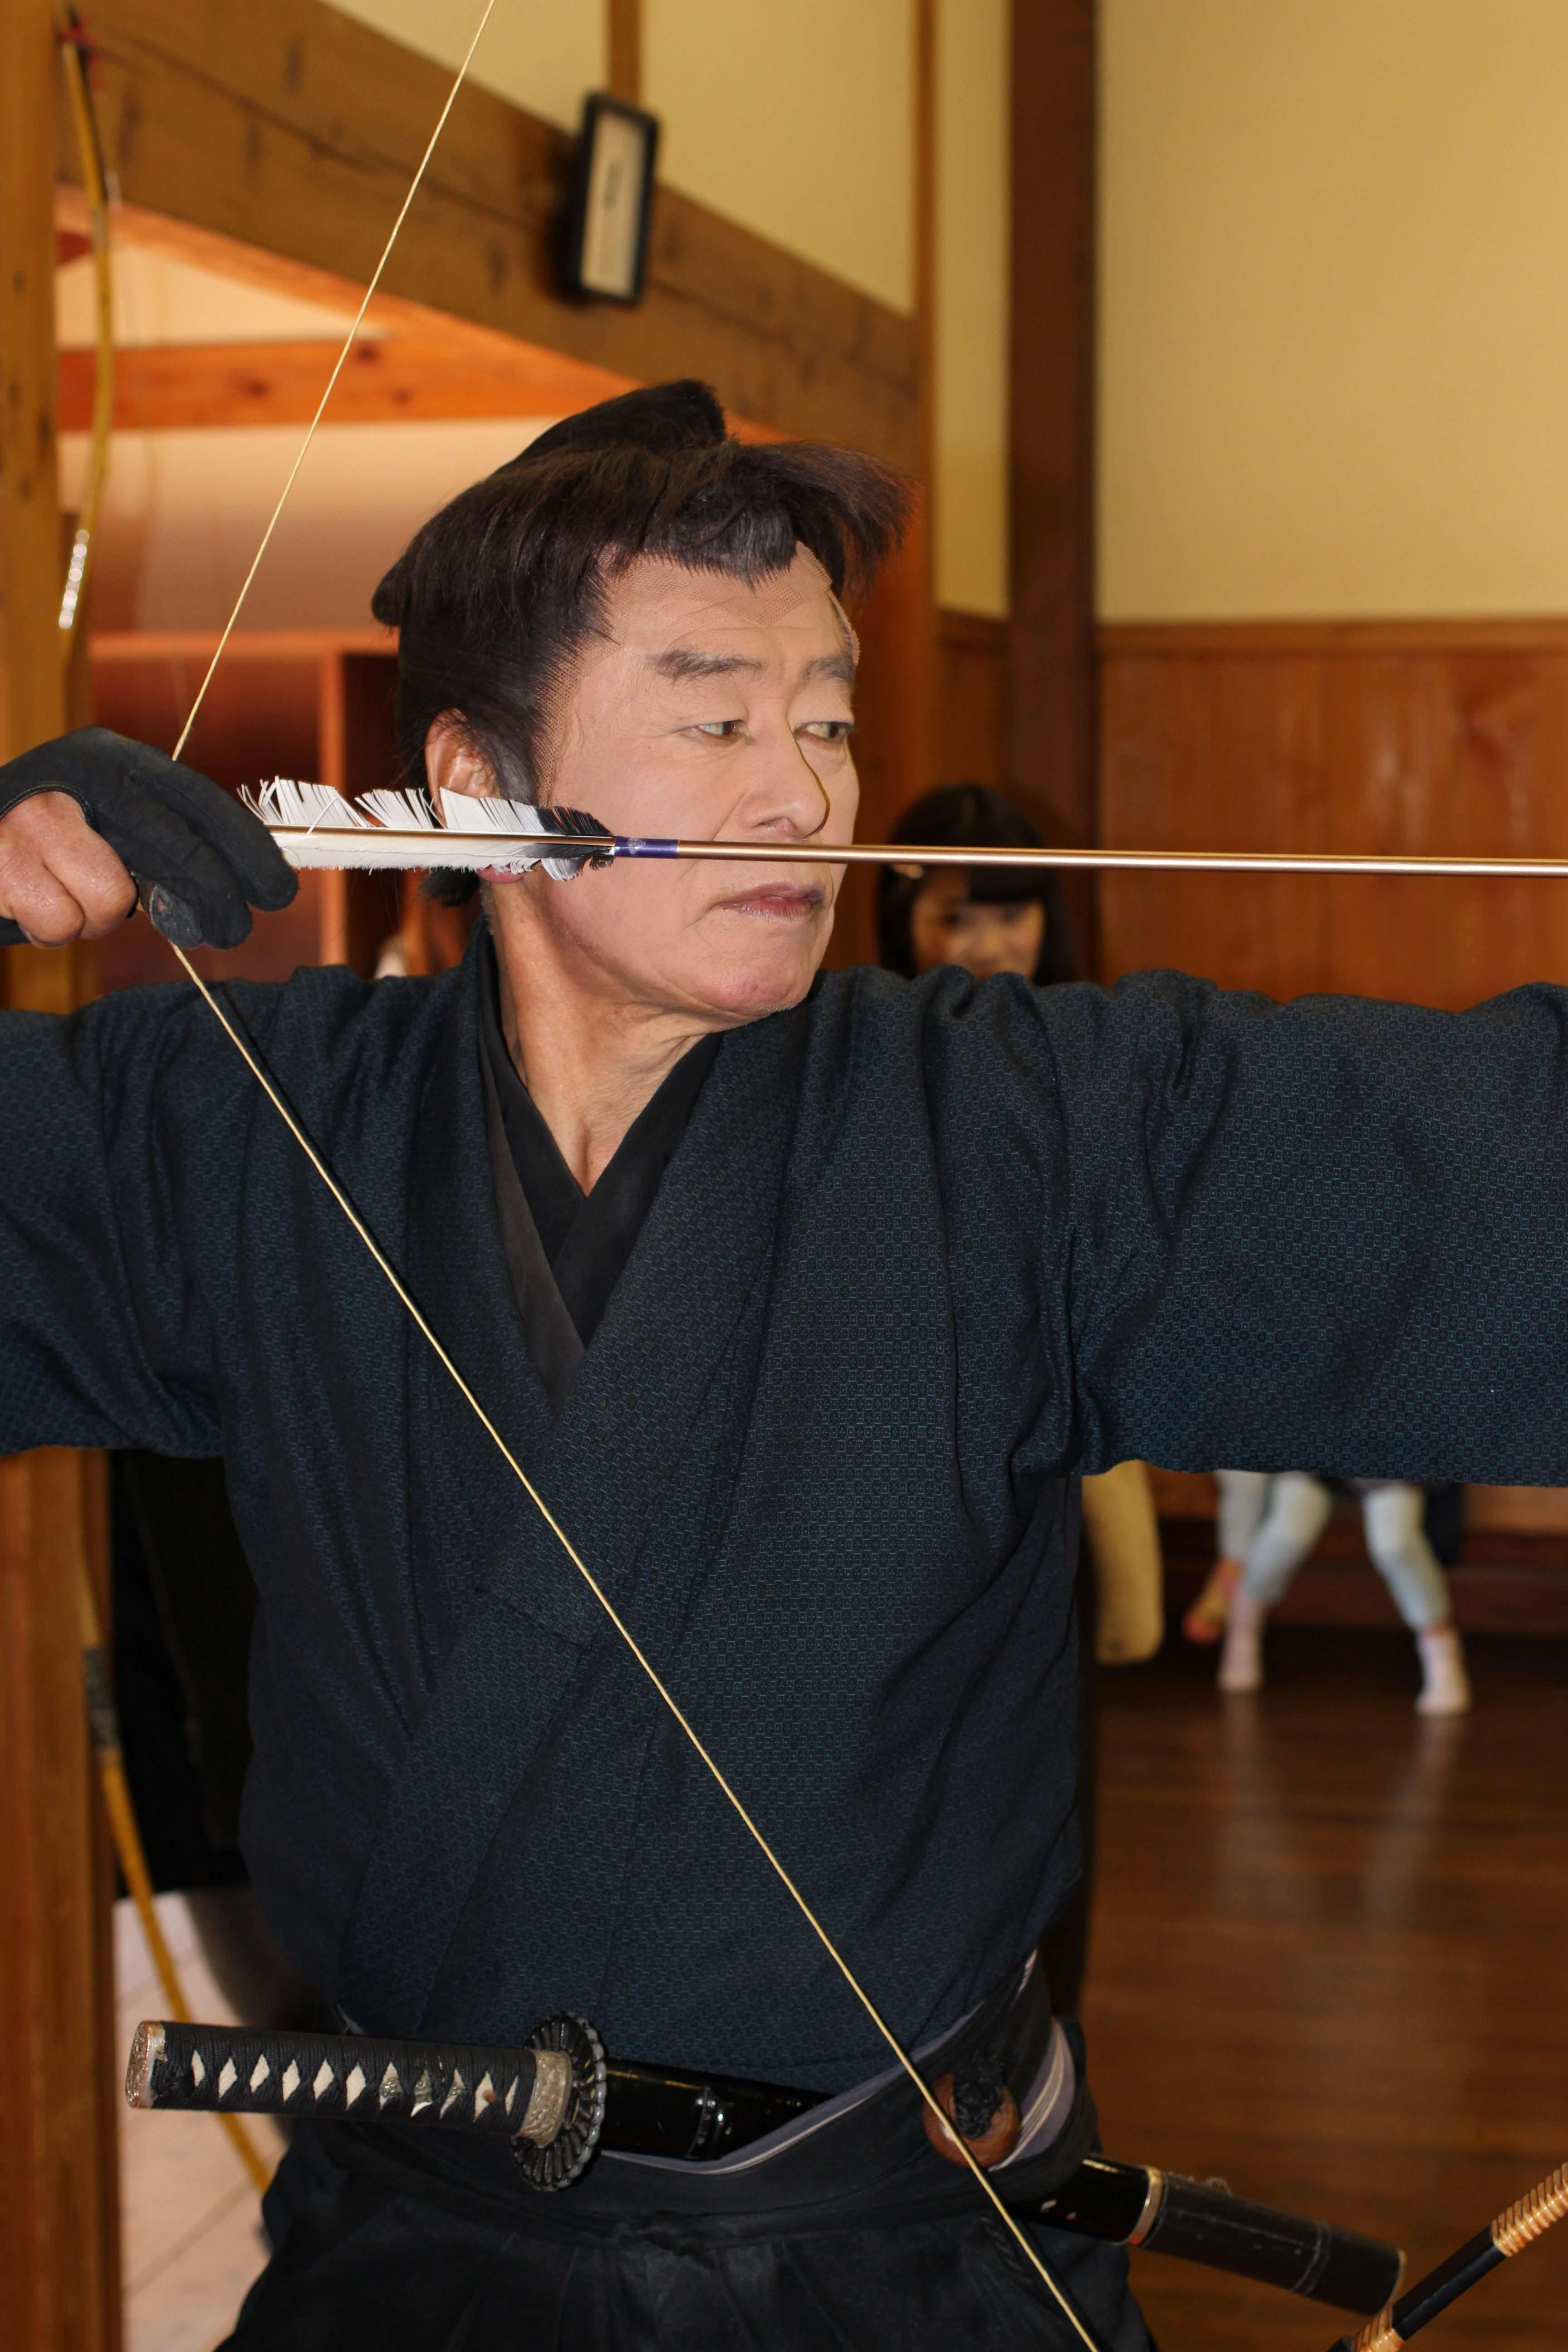 Samurai (acting) demonstrating Japanese archery